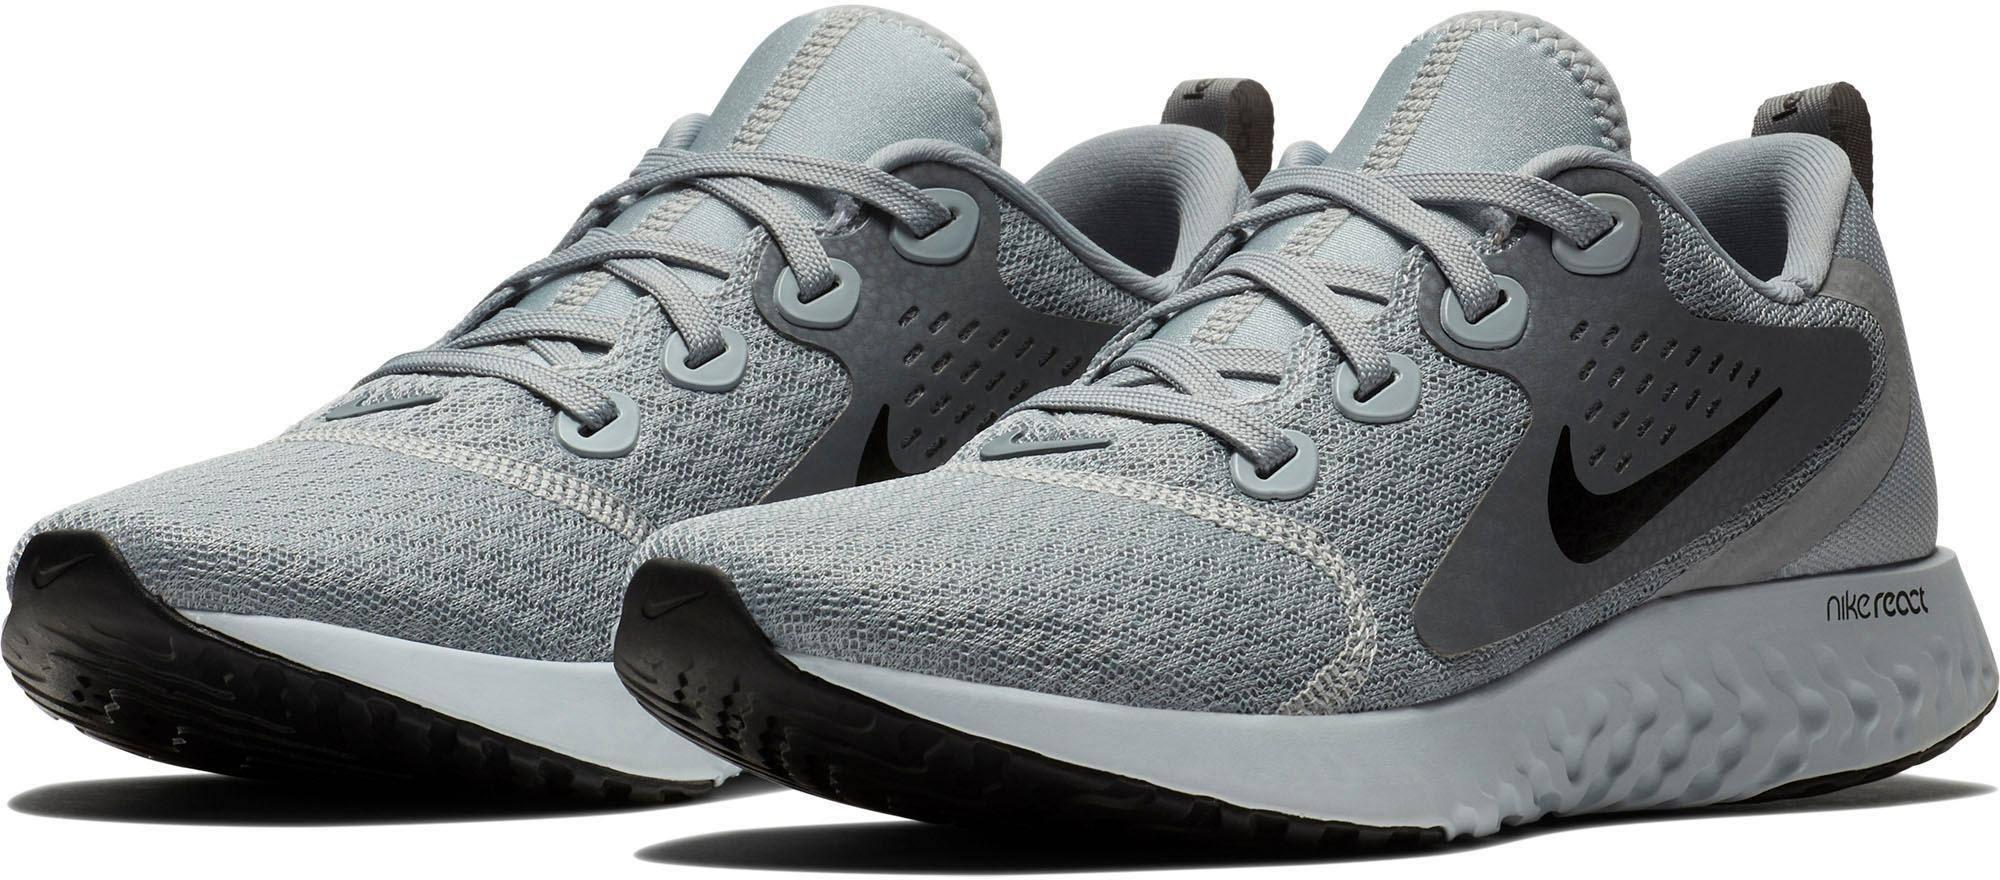 37 Laufschuhe Silber Grau React Grau 5 Gr Nike Damen Legend xTY1waFnq